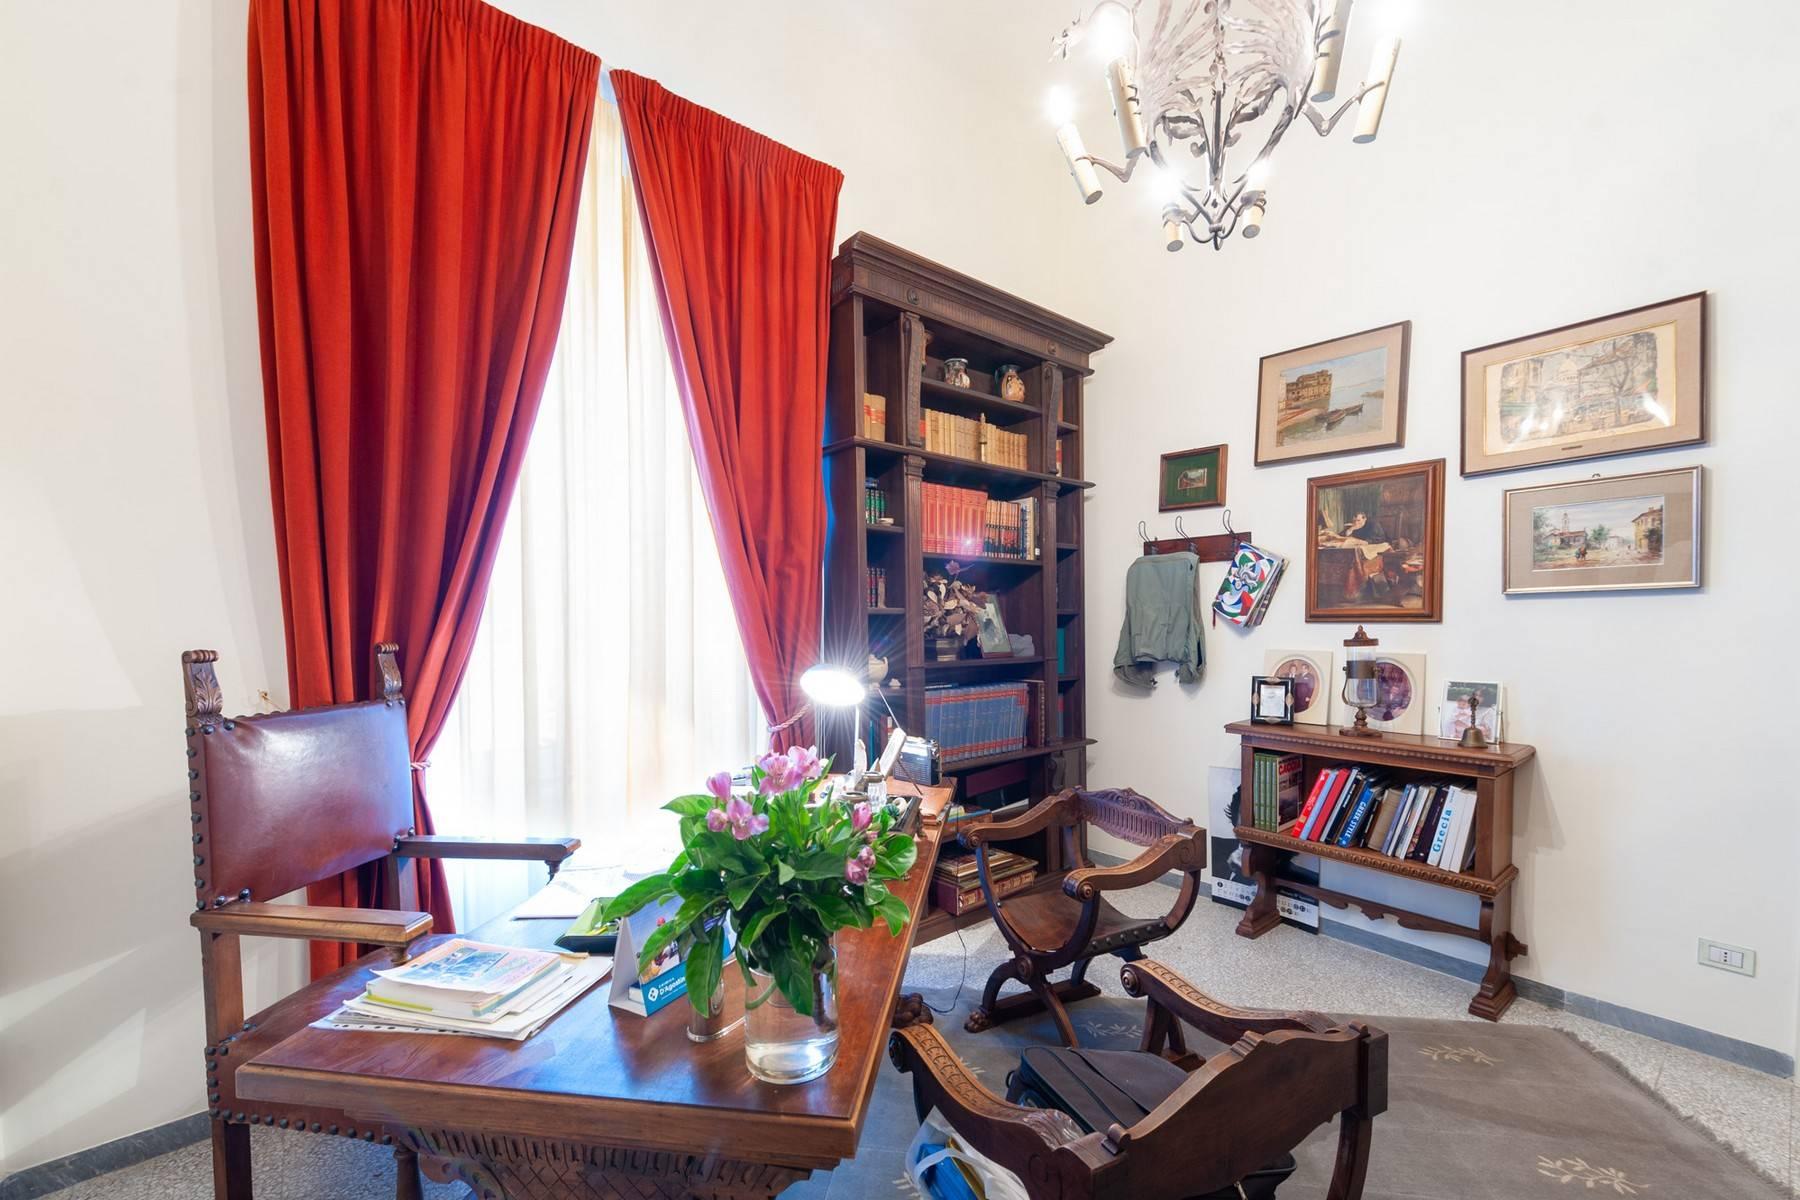 Splendida villa gentilizia del '600 circondata da agrumeti - 32